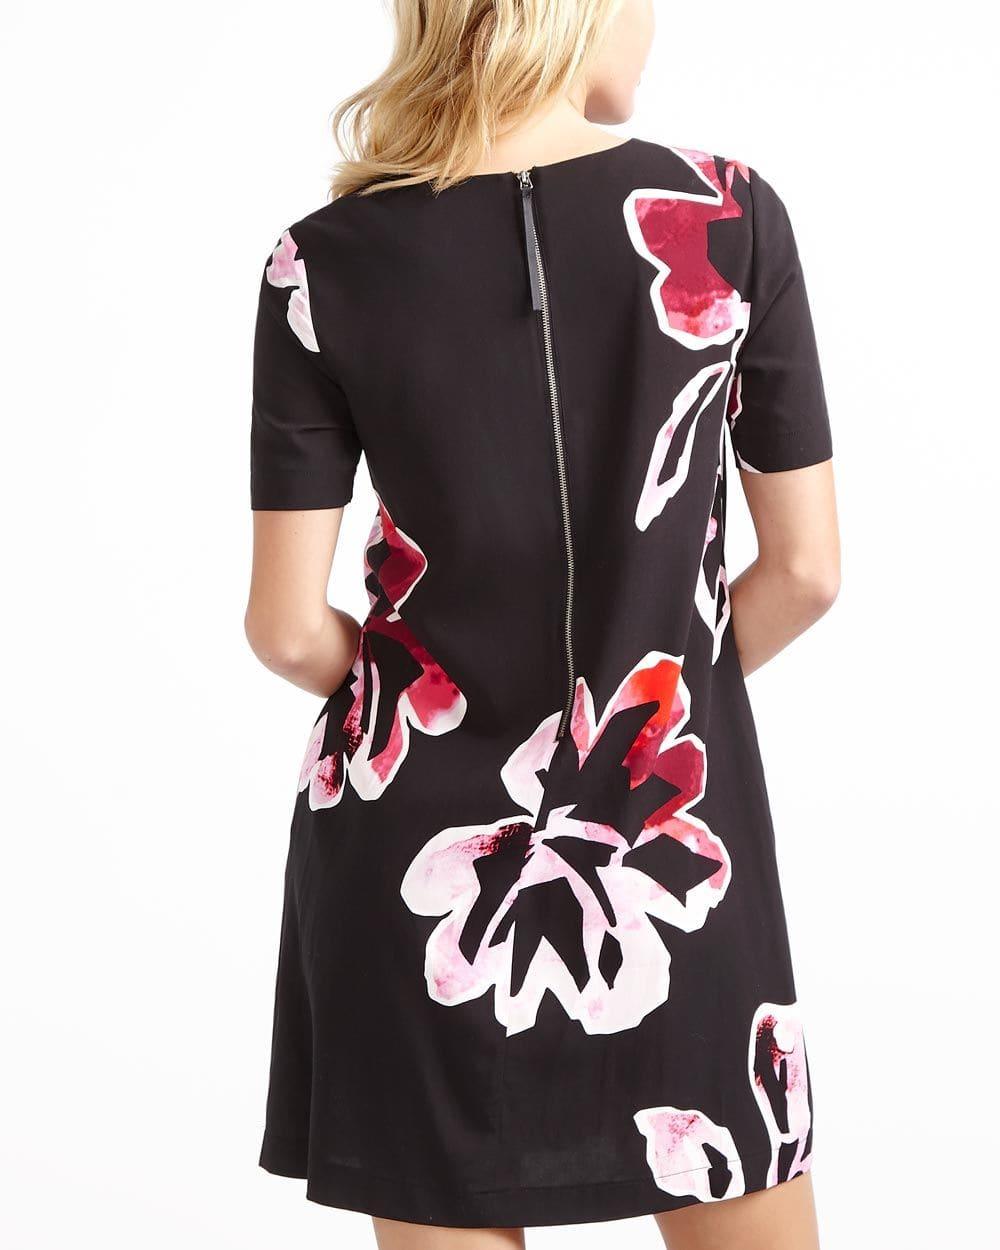 Printed Swing Dress